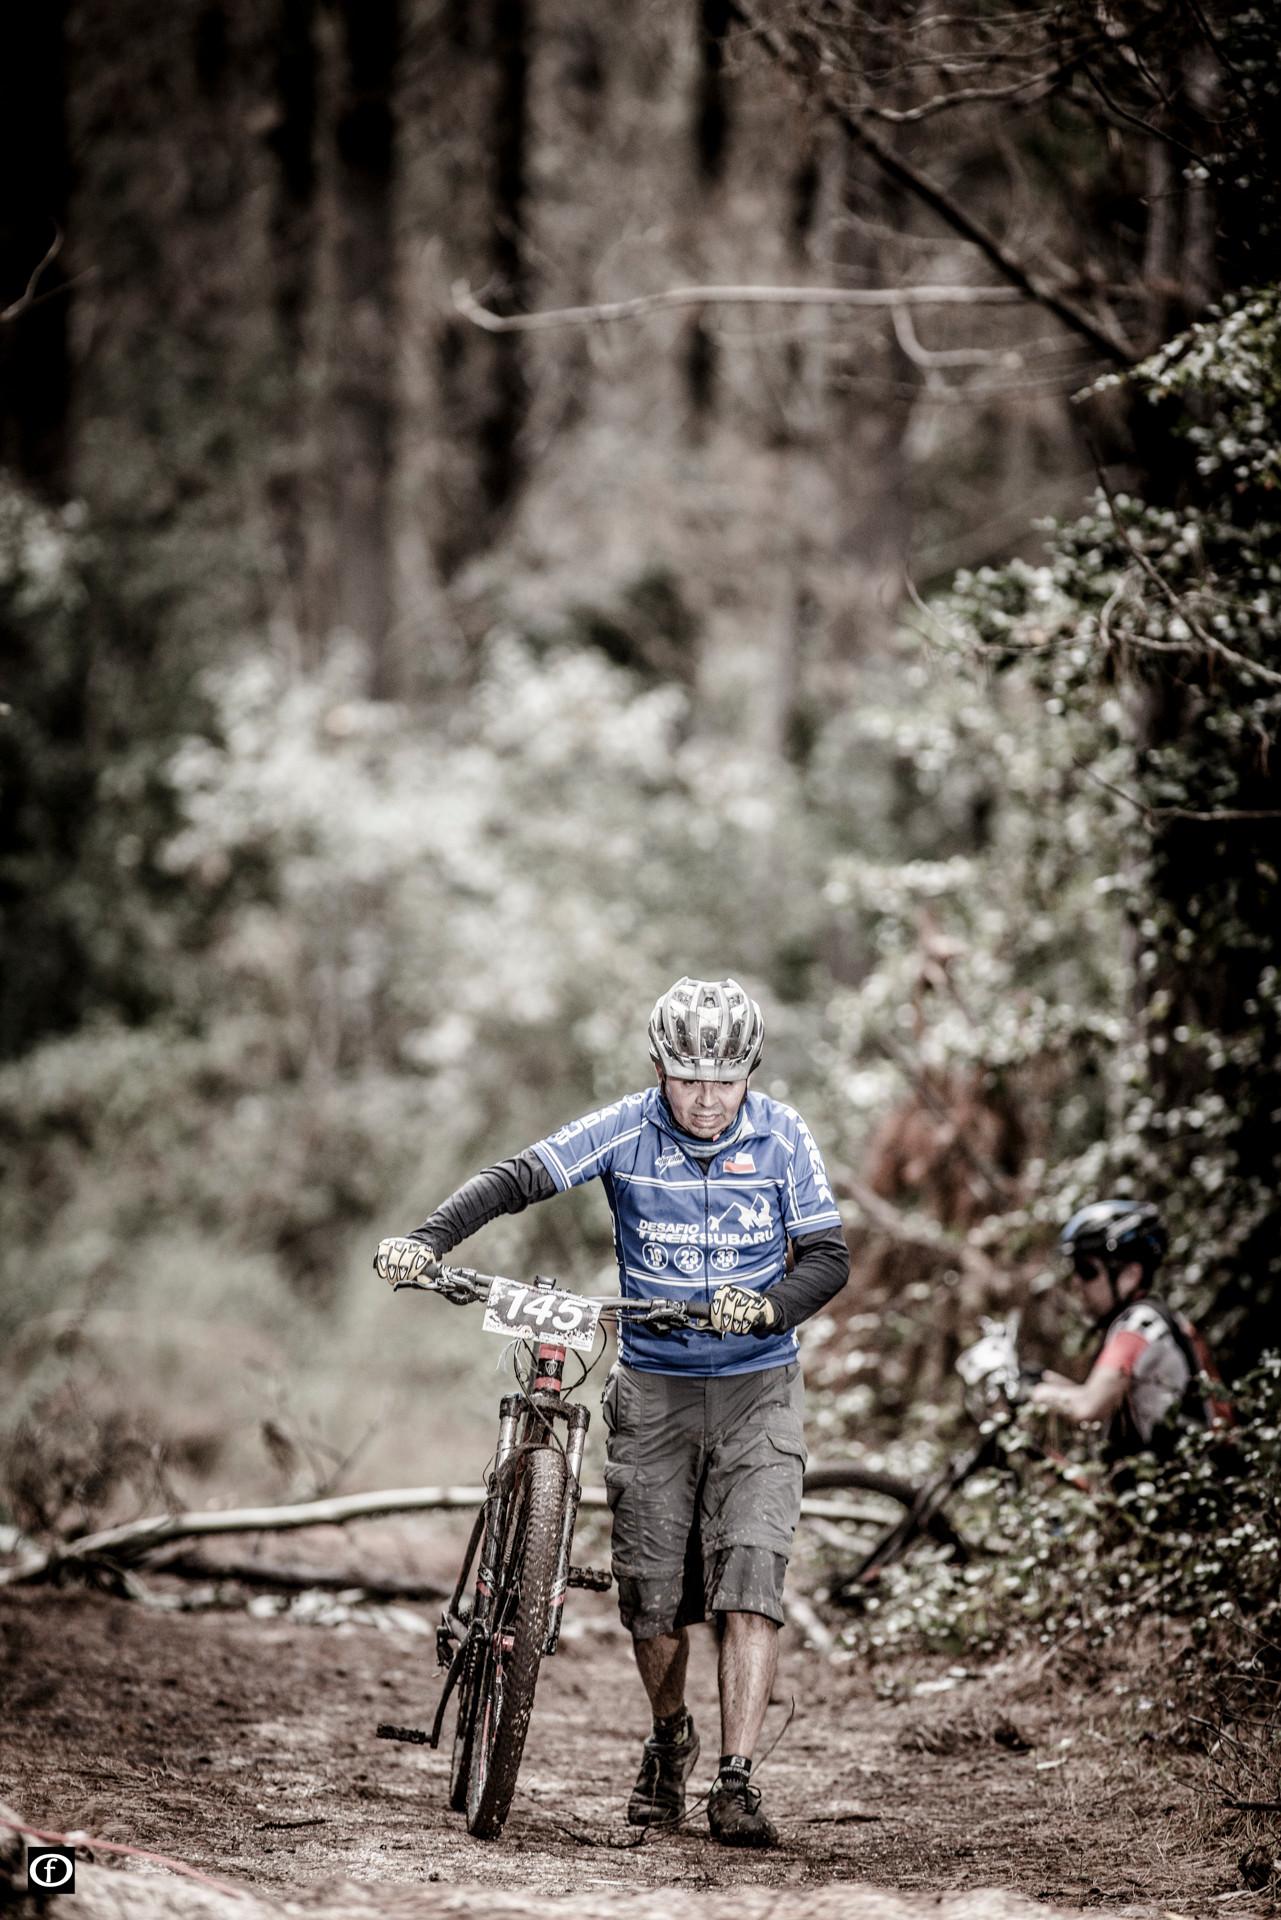 2015-05-17-Ciclismo Enduro-65.jpg